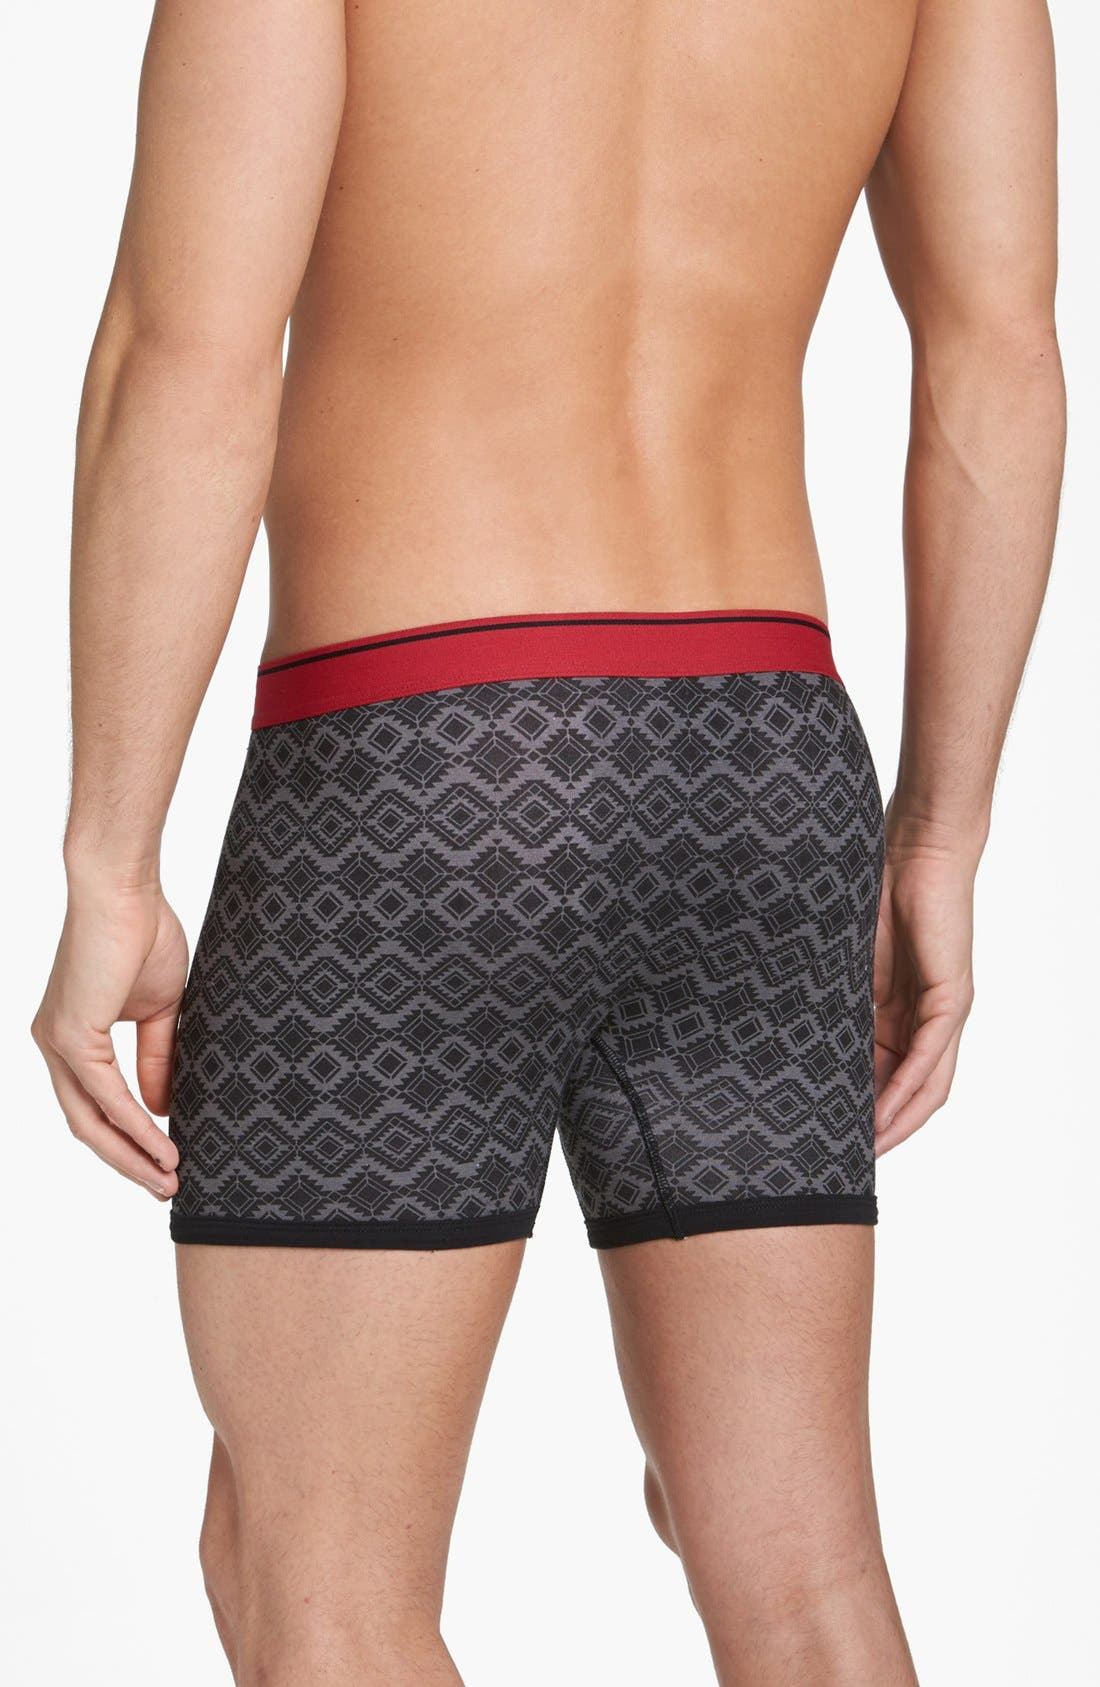 Alternate Image 4  - Basic Underwear 'Bottoms Out' Pattern Boxer Briefs (3-Pack)